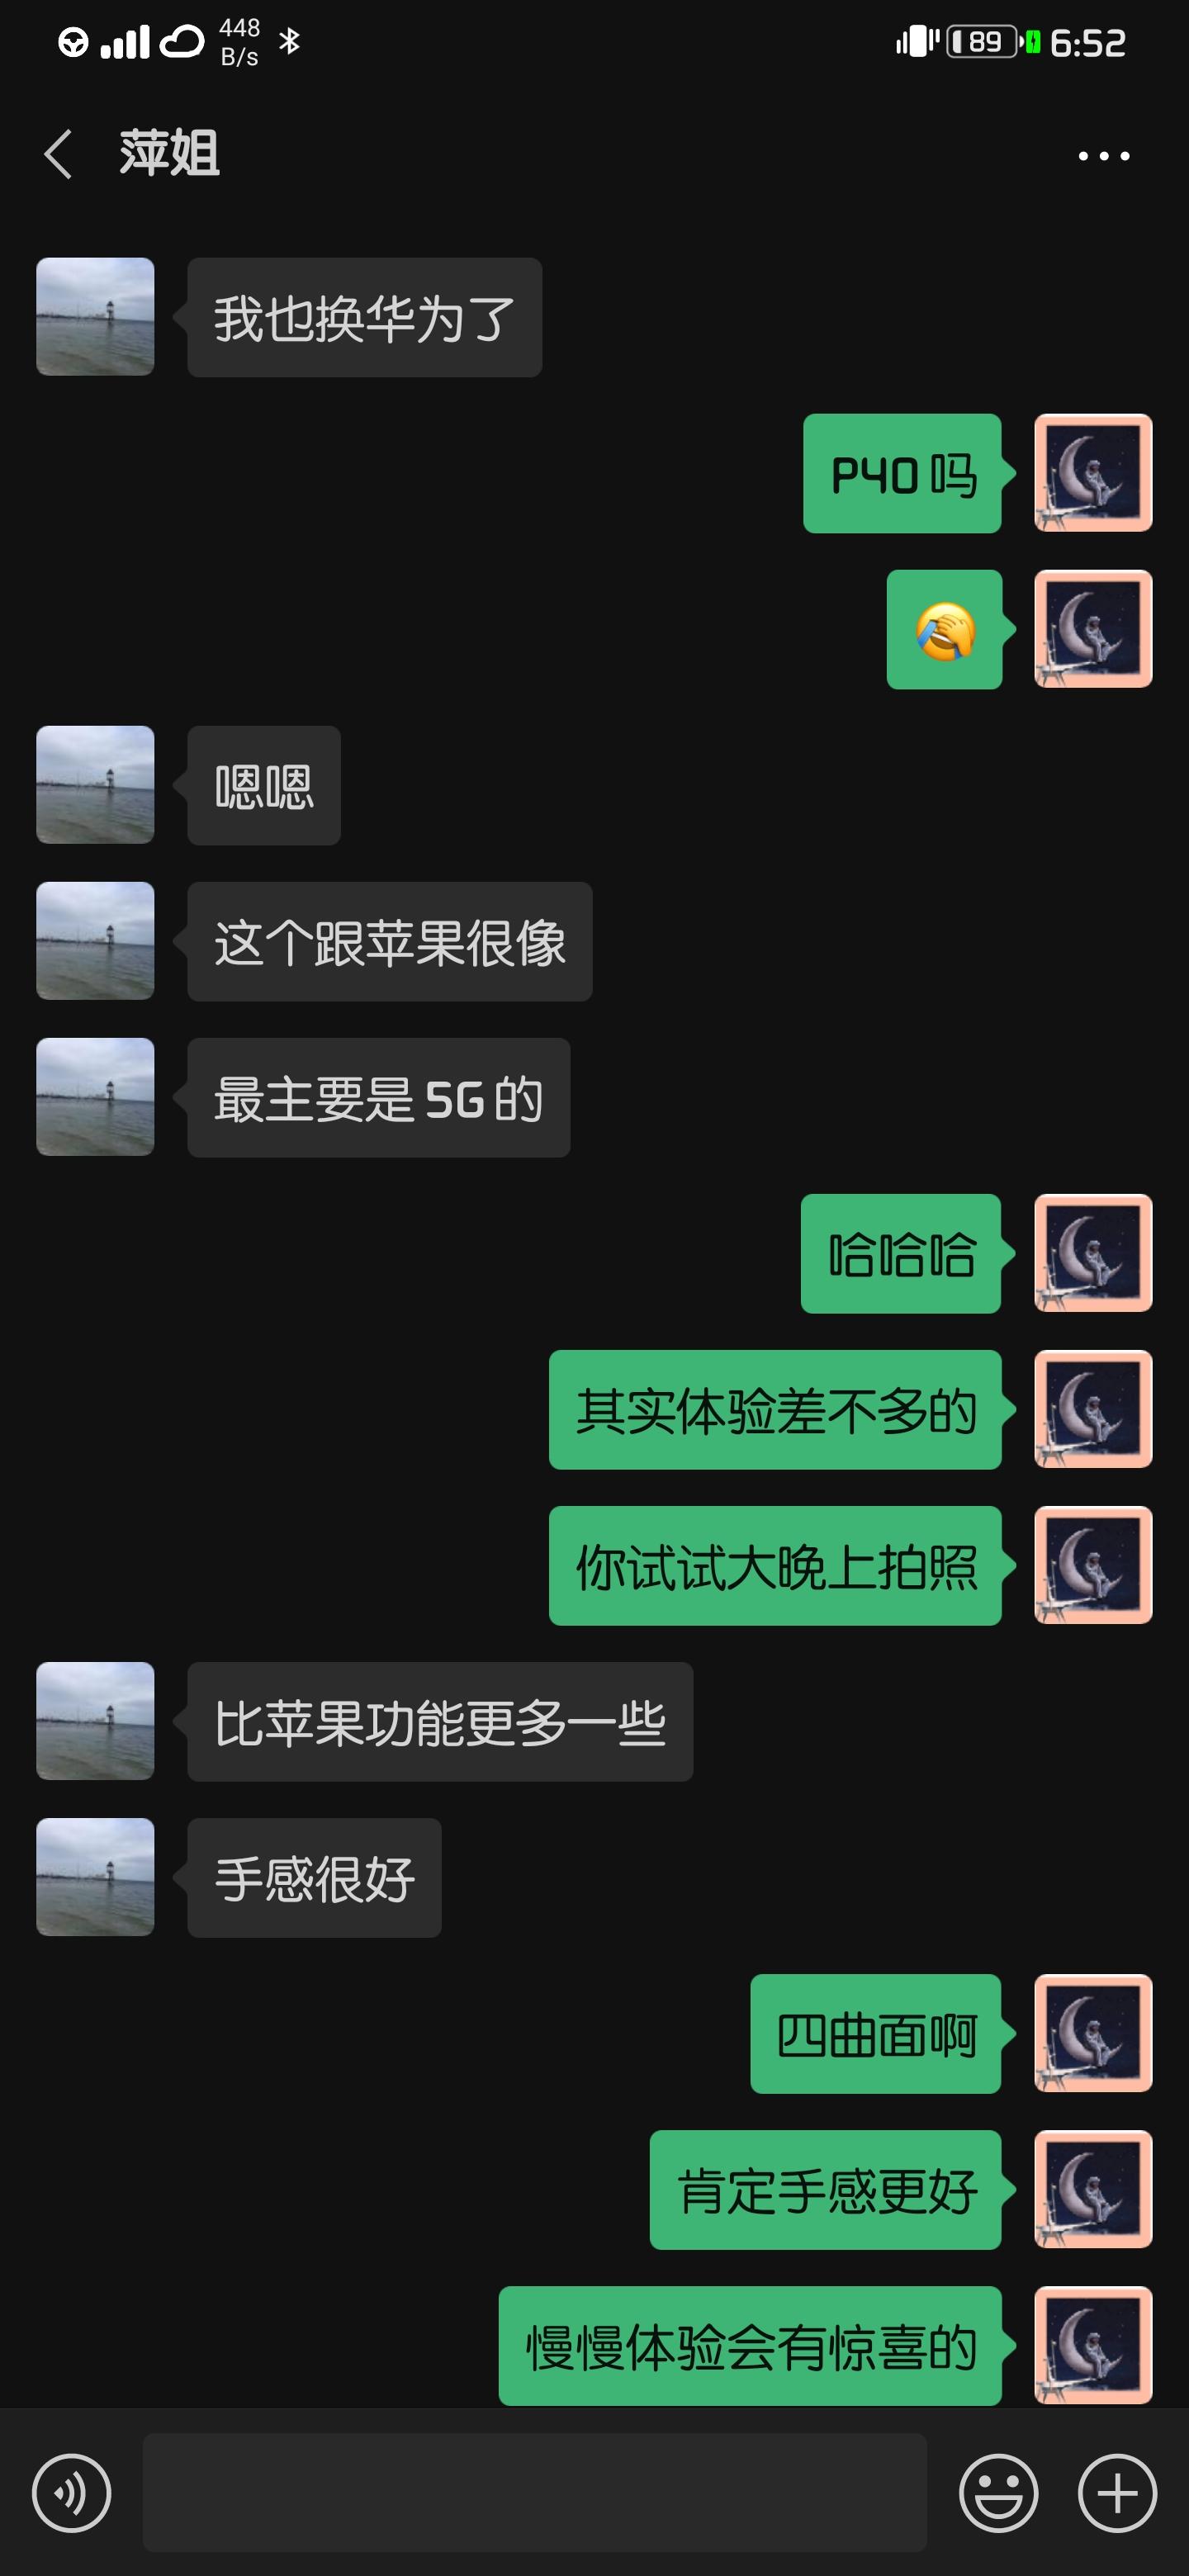 Screenshot_20200517_185206_com.tencent.mm.jpg